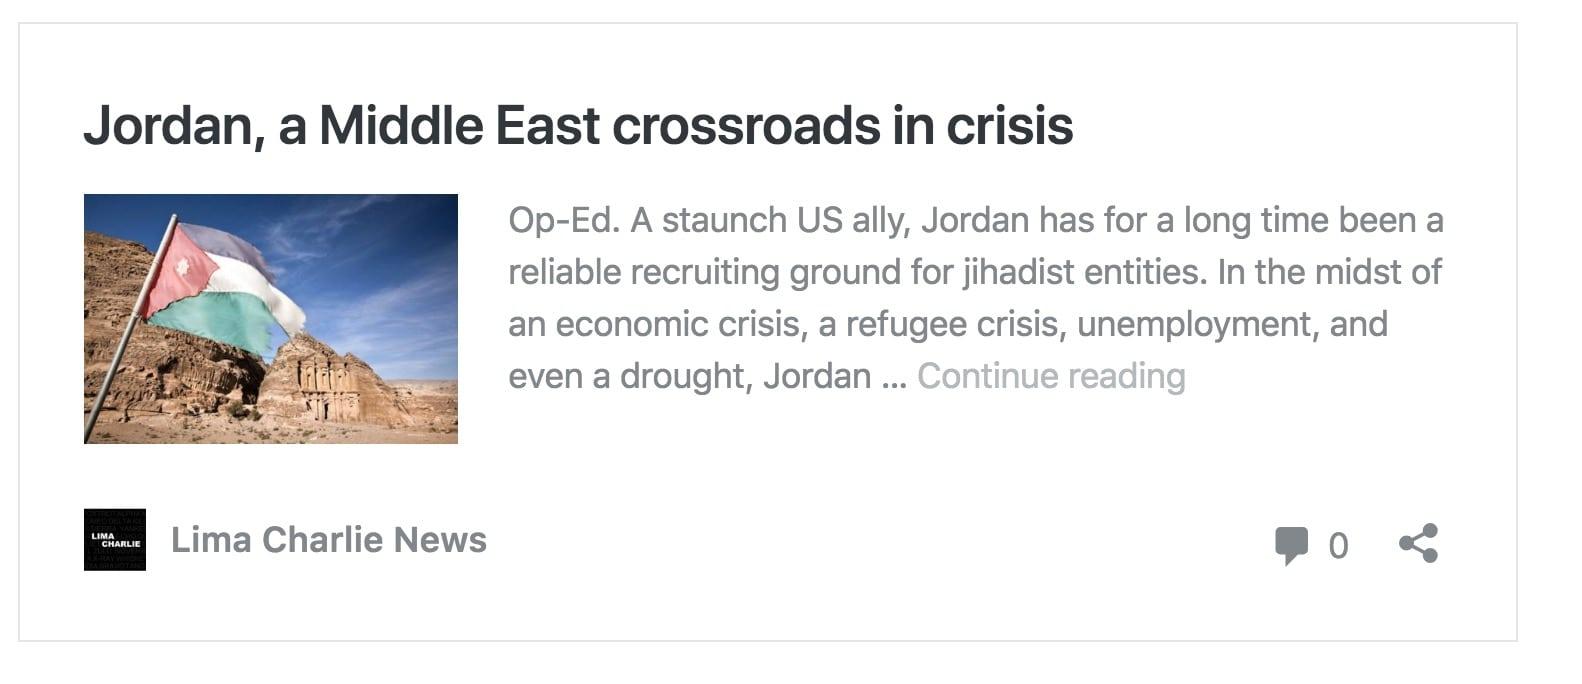 Image Lima Charlie News Headline Jordan Crossroads